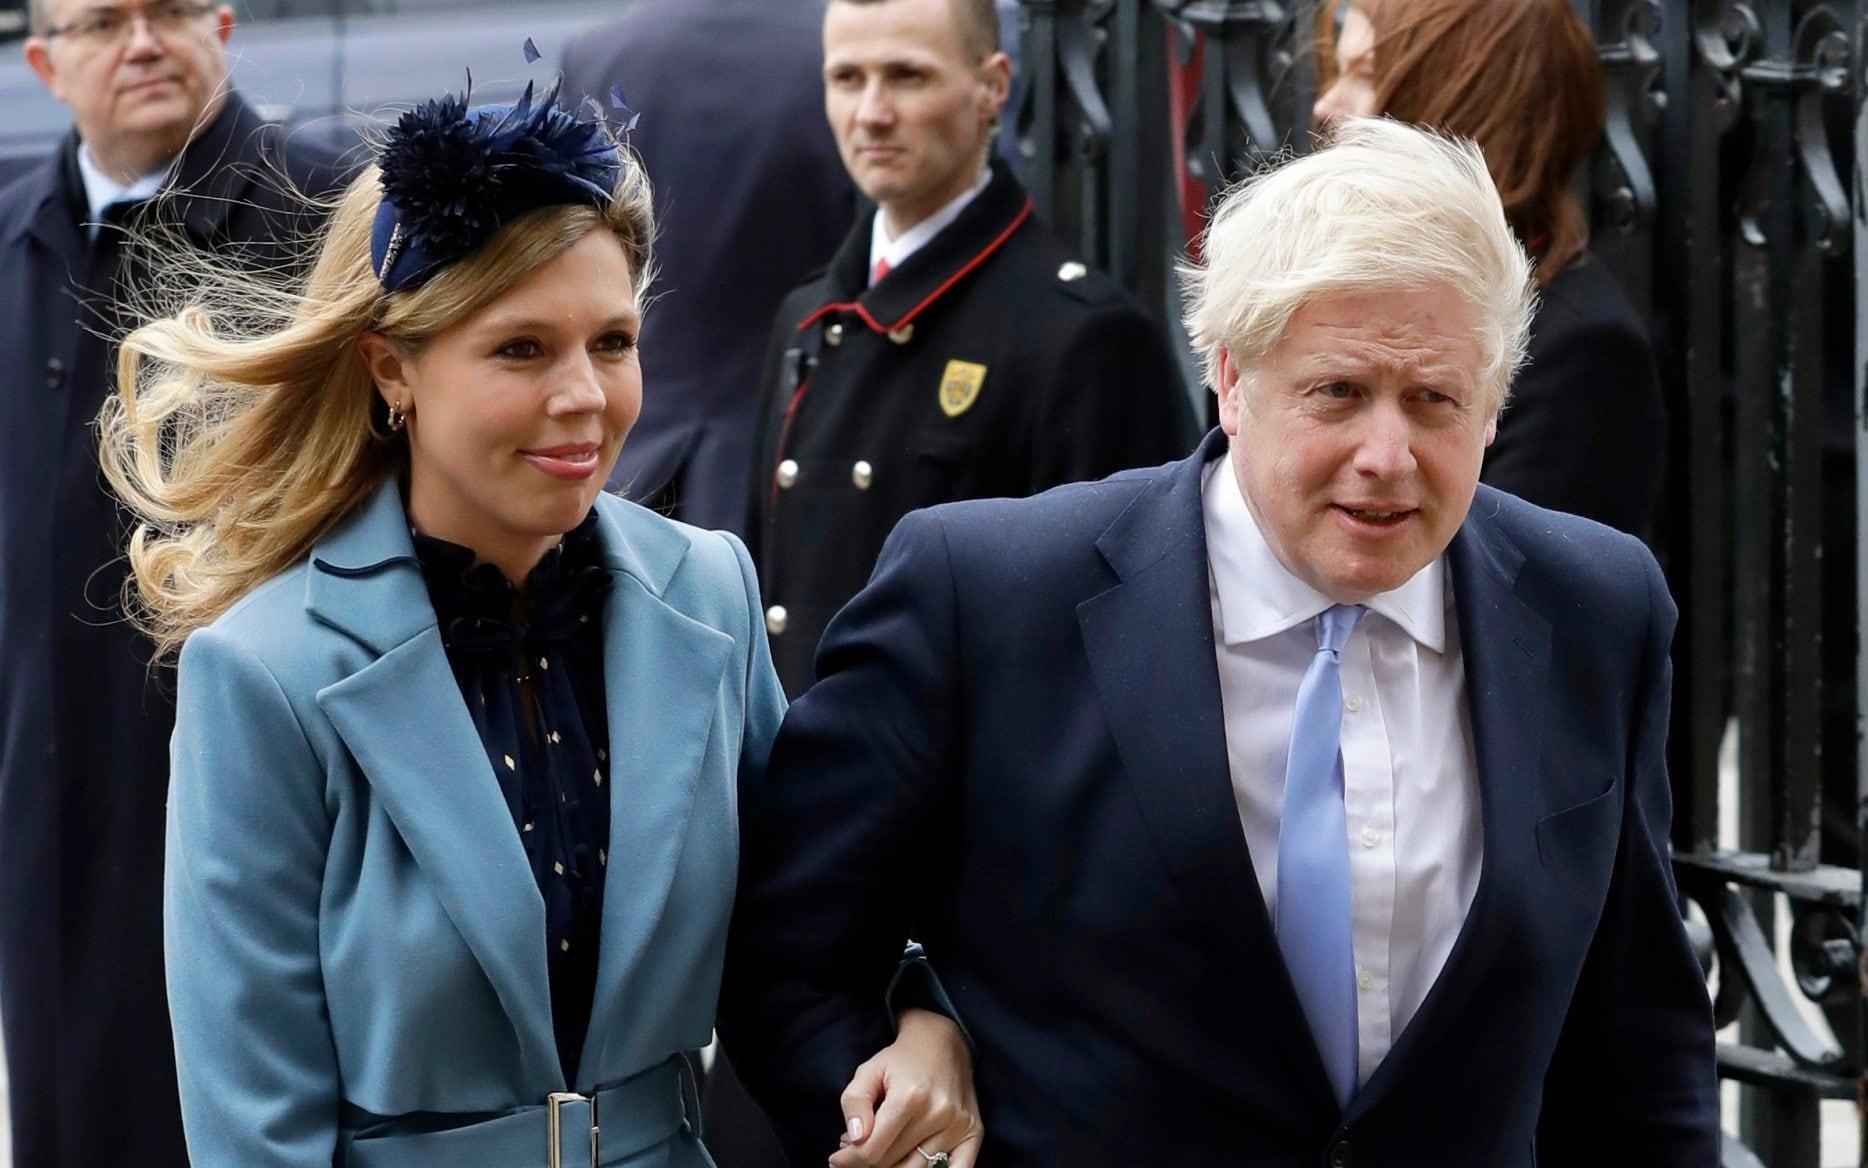 Boris Johnsons pregnant fiancee Carrie Symonds suffers coronavirus symptoms